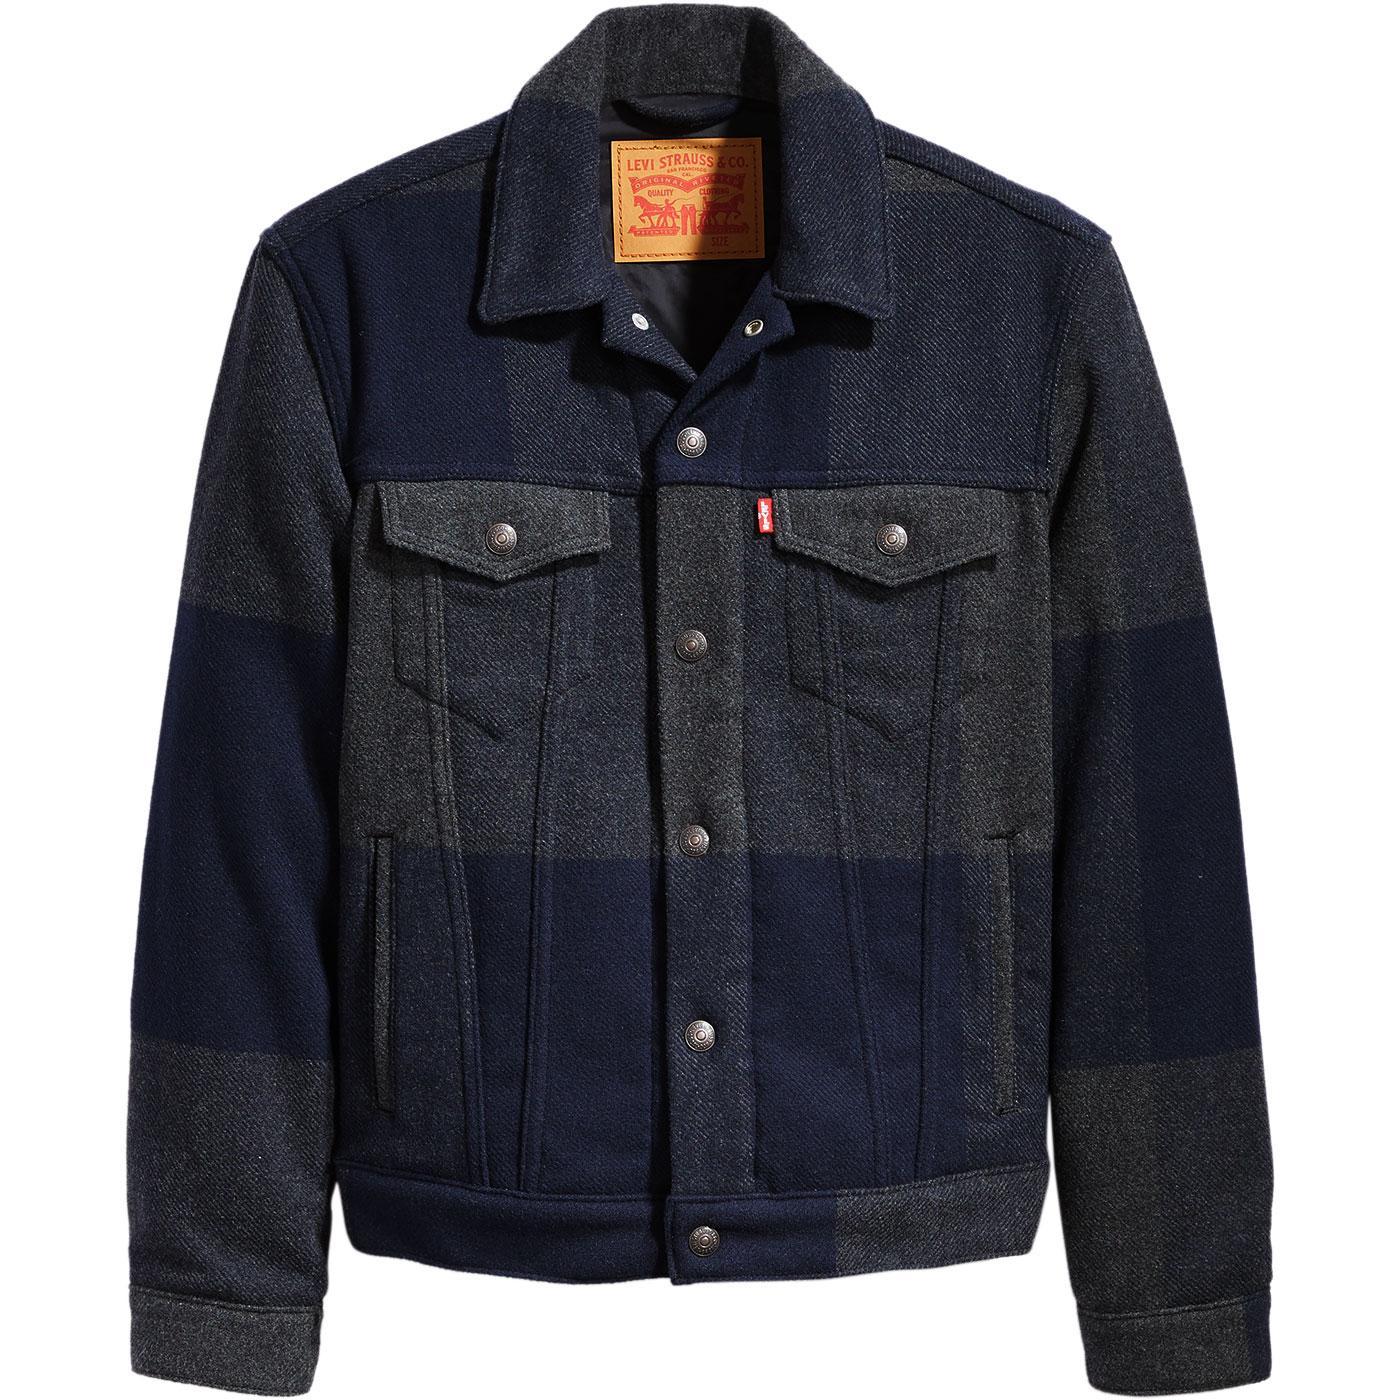 LEVI'S Retro Mod Wool Check Trucker Jacket GELADA